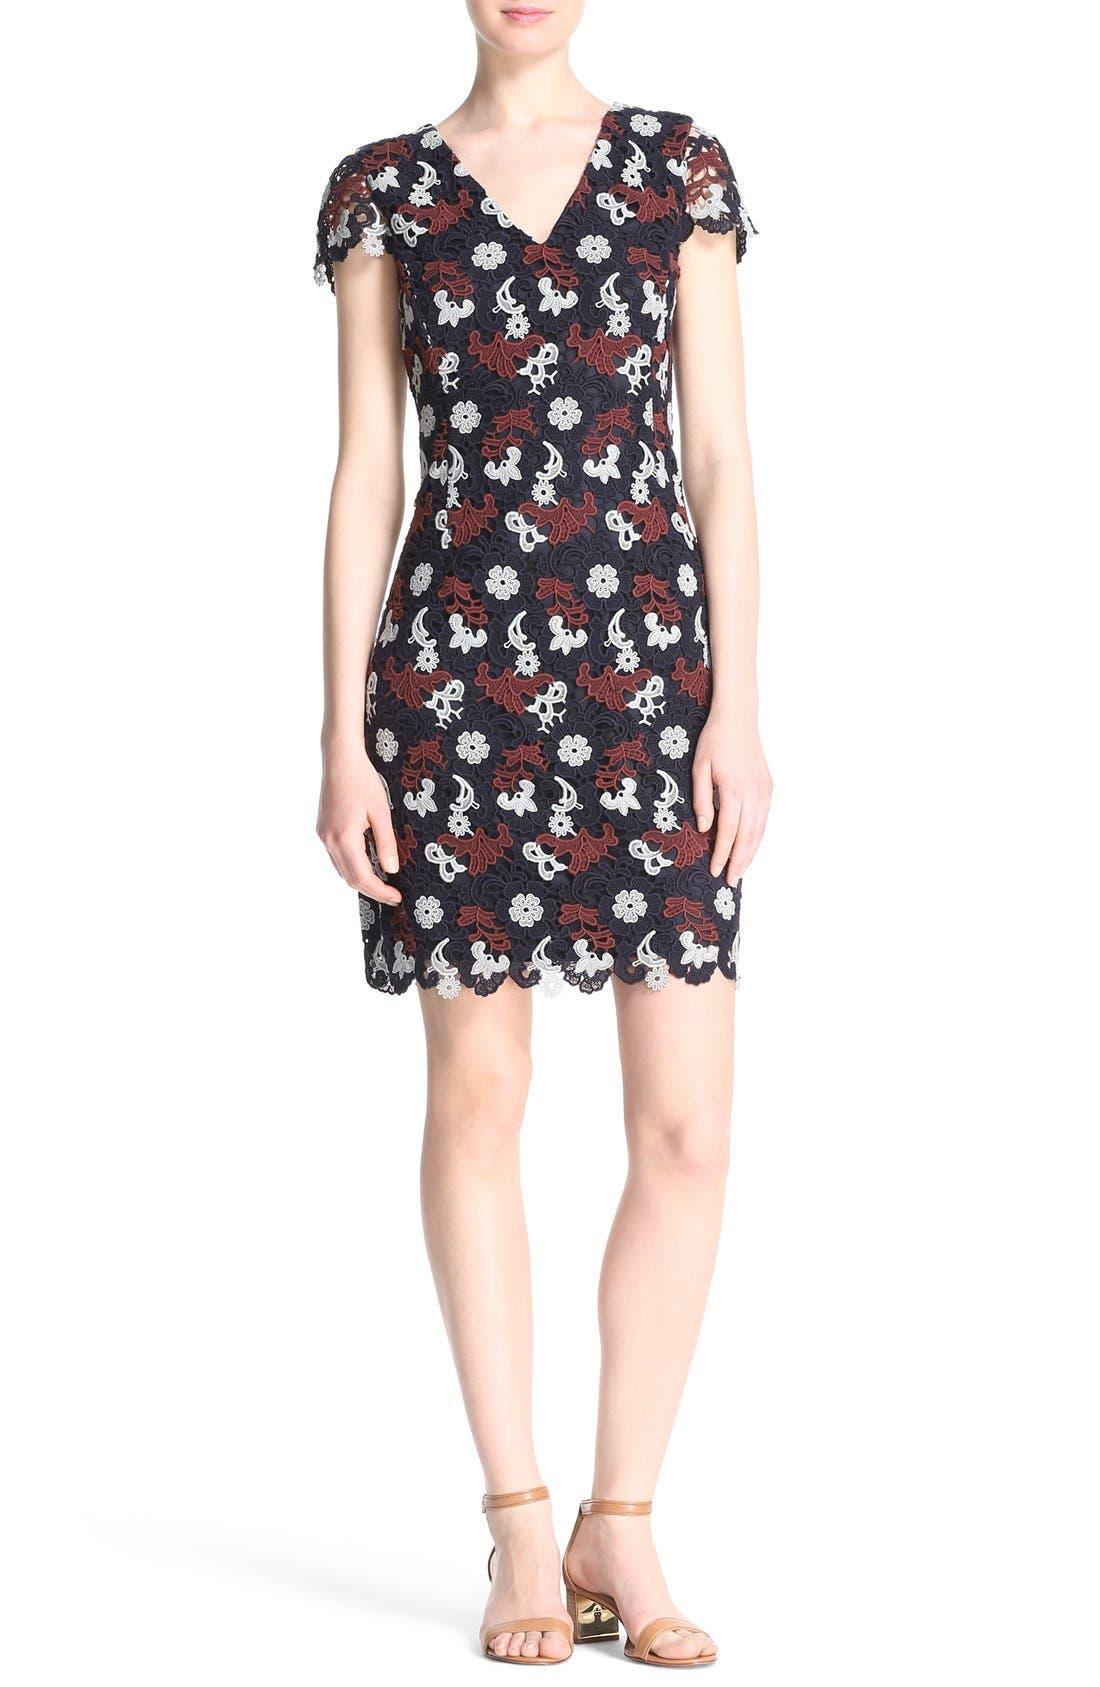 Alternate Image 1 Selected - Tory Burch Cap Sleeve Guipure Lace Dress